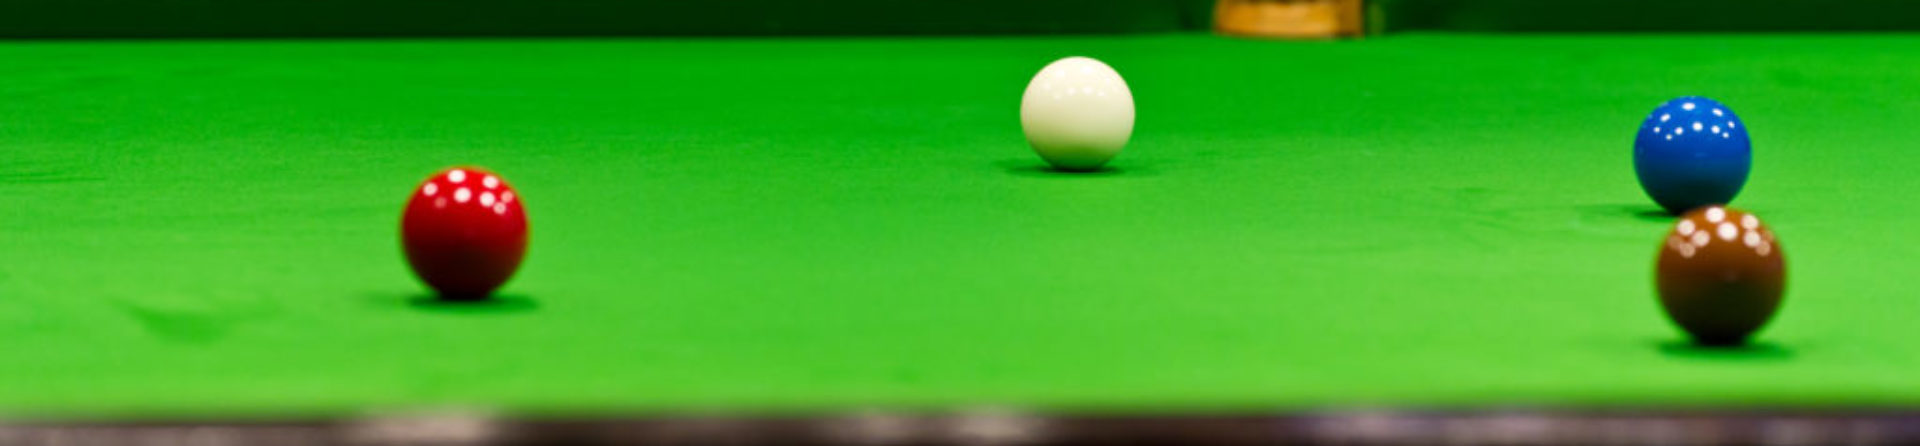 Snooker Gestern